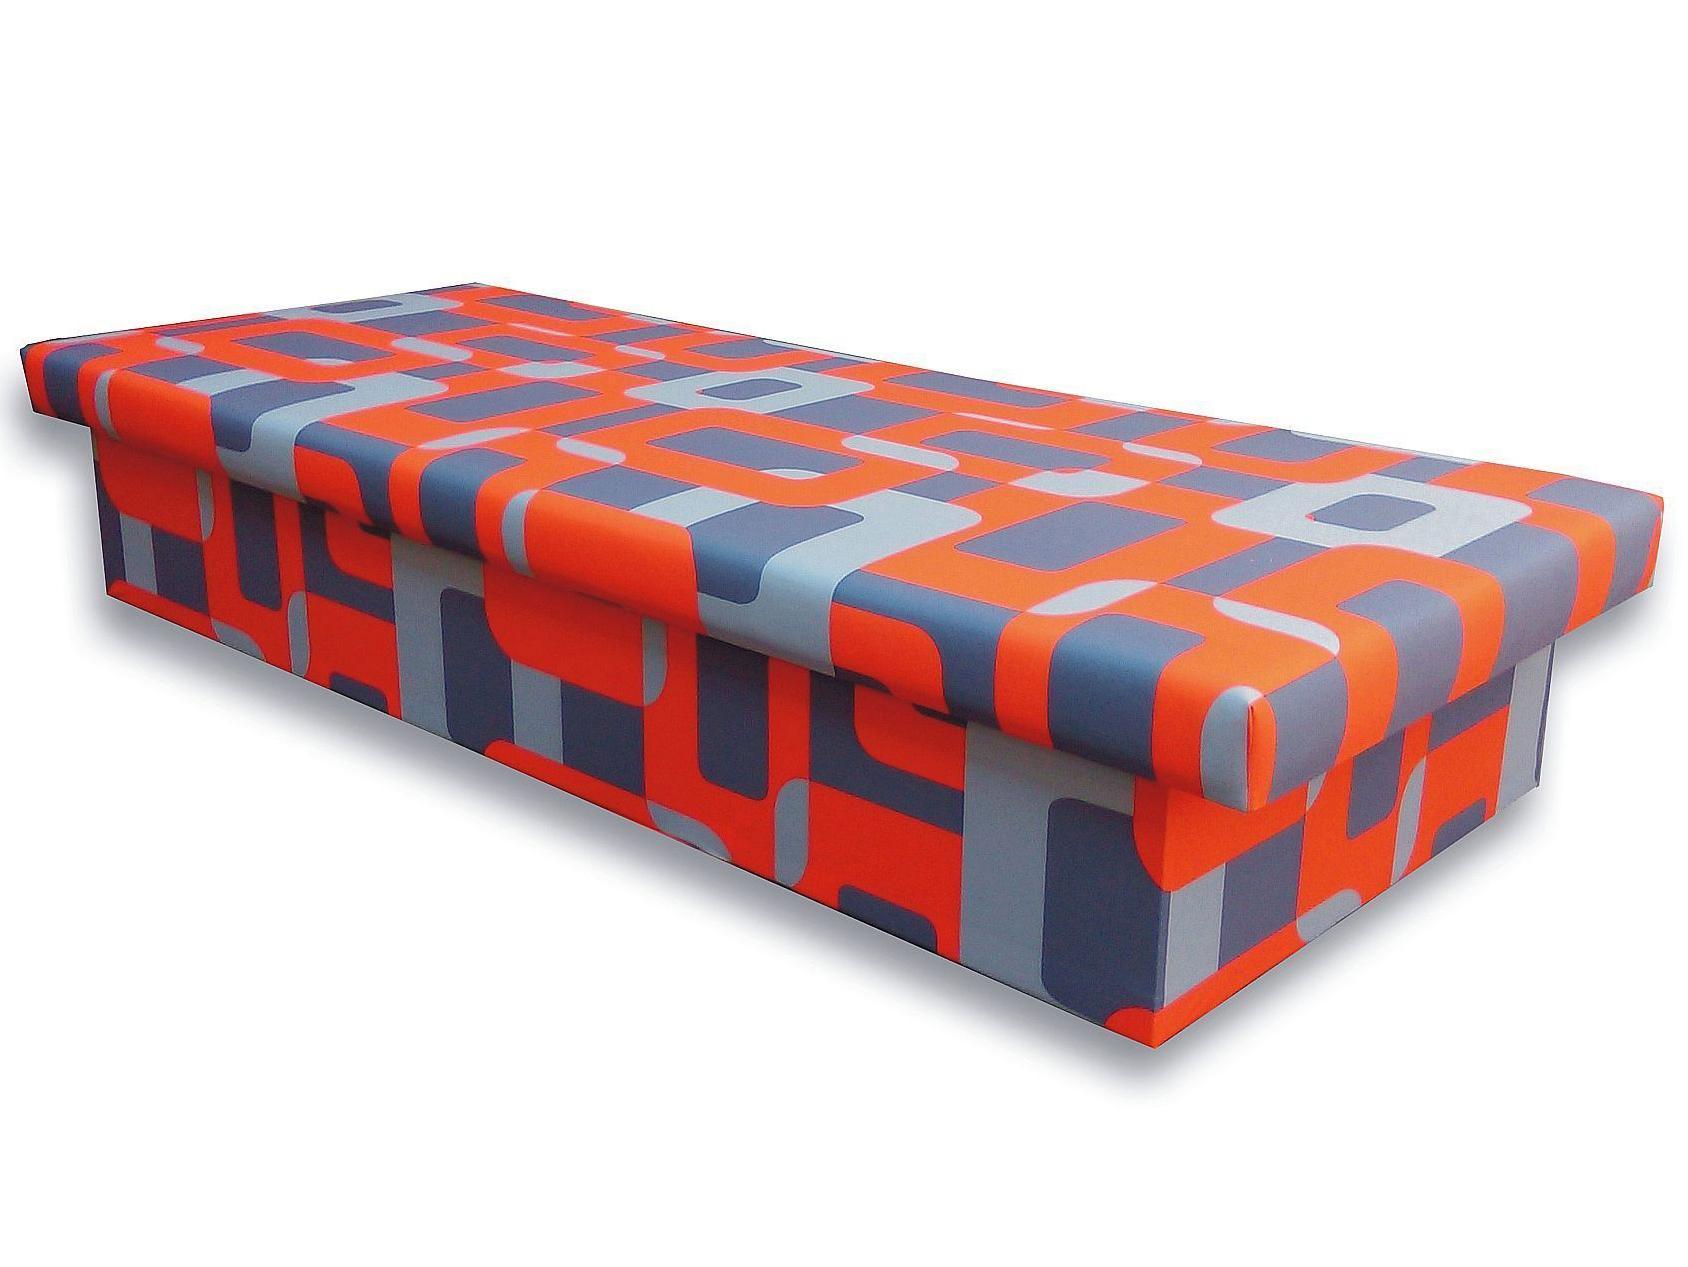 Jednolôžková posteľ (váľanda) 80 cm Jana 10 (Gusto 6A oranžová)